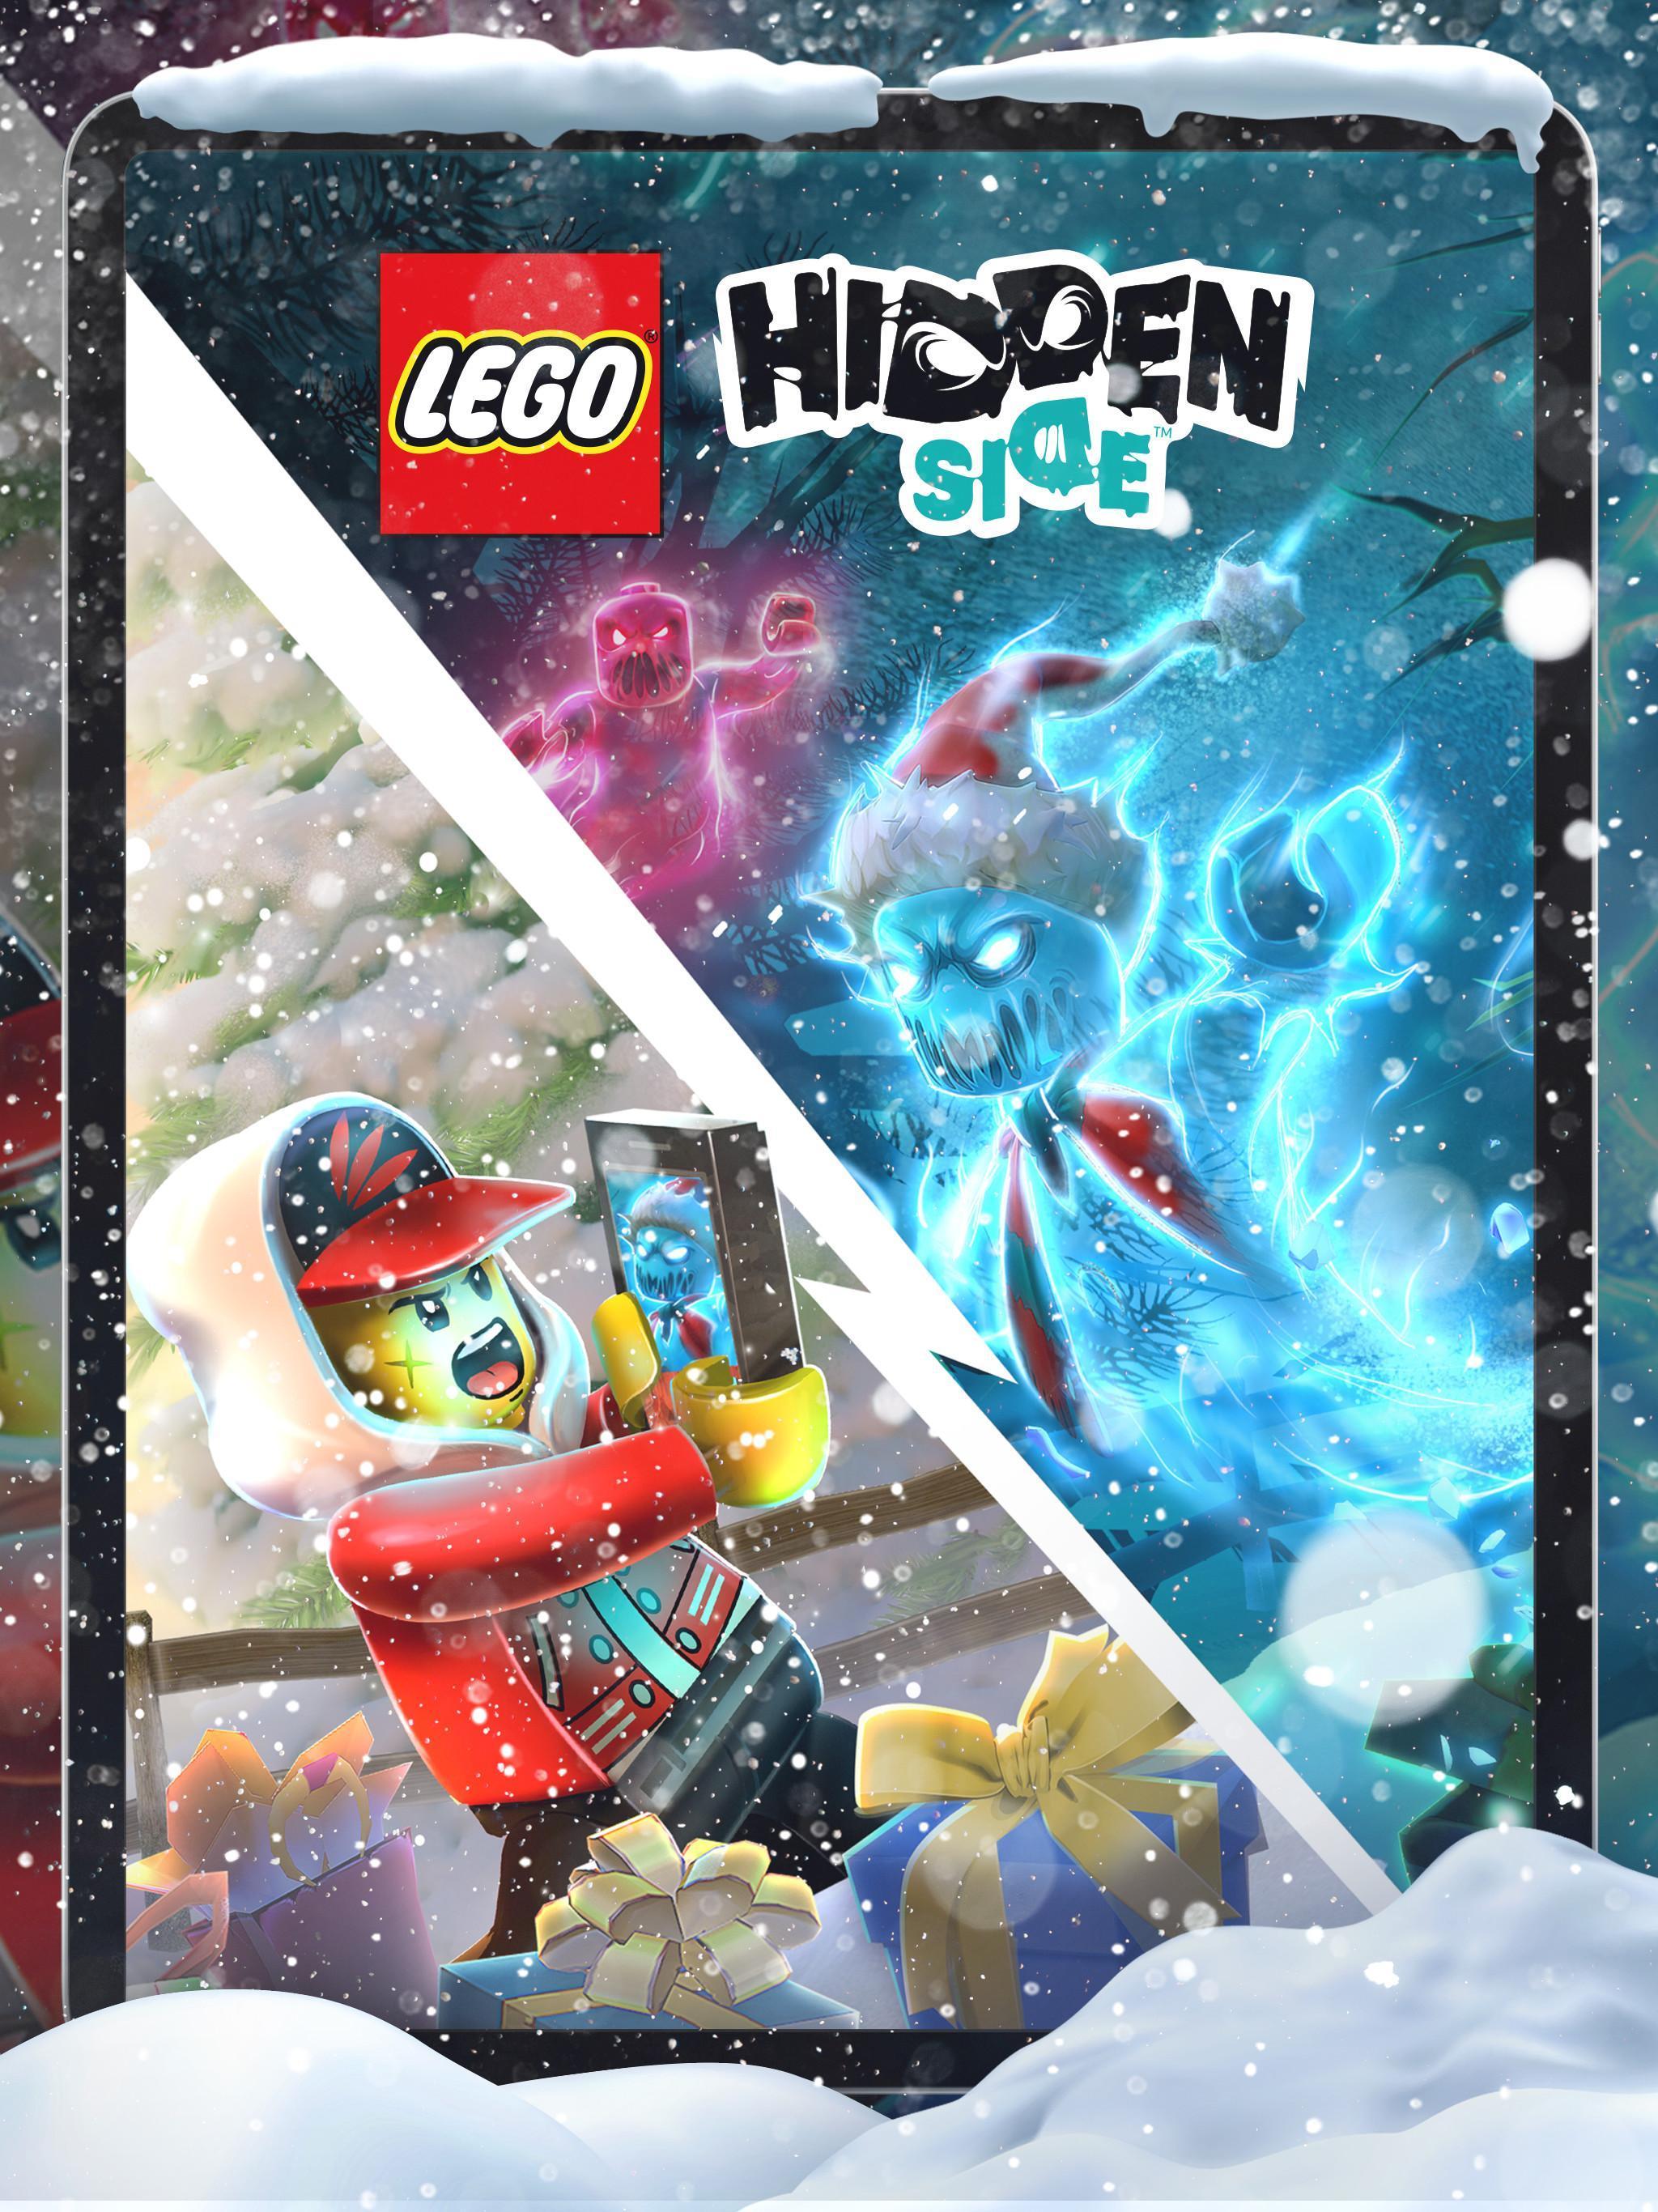 Download Lego Hidden Side Apk Startapk